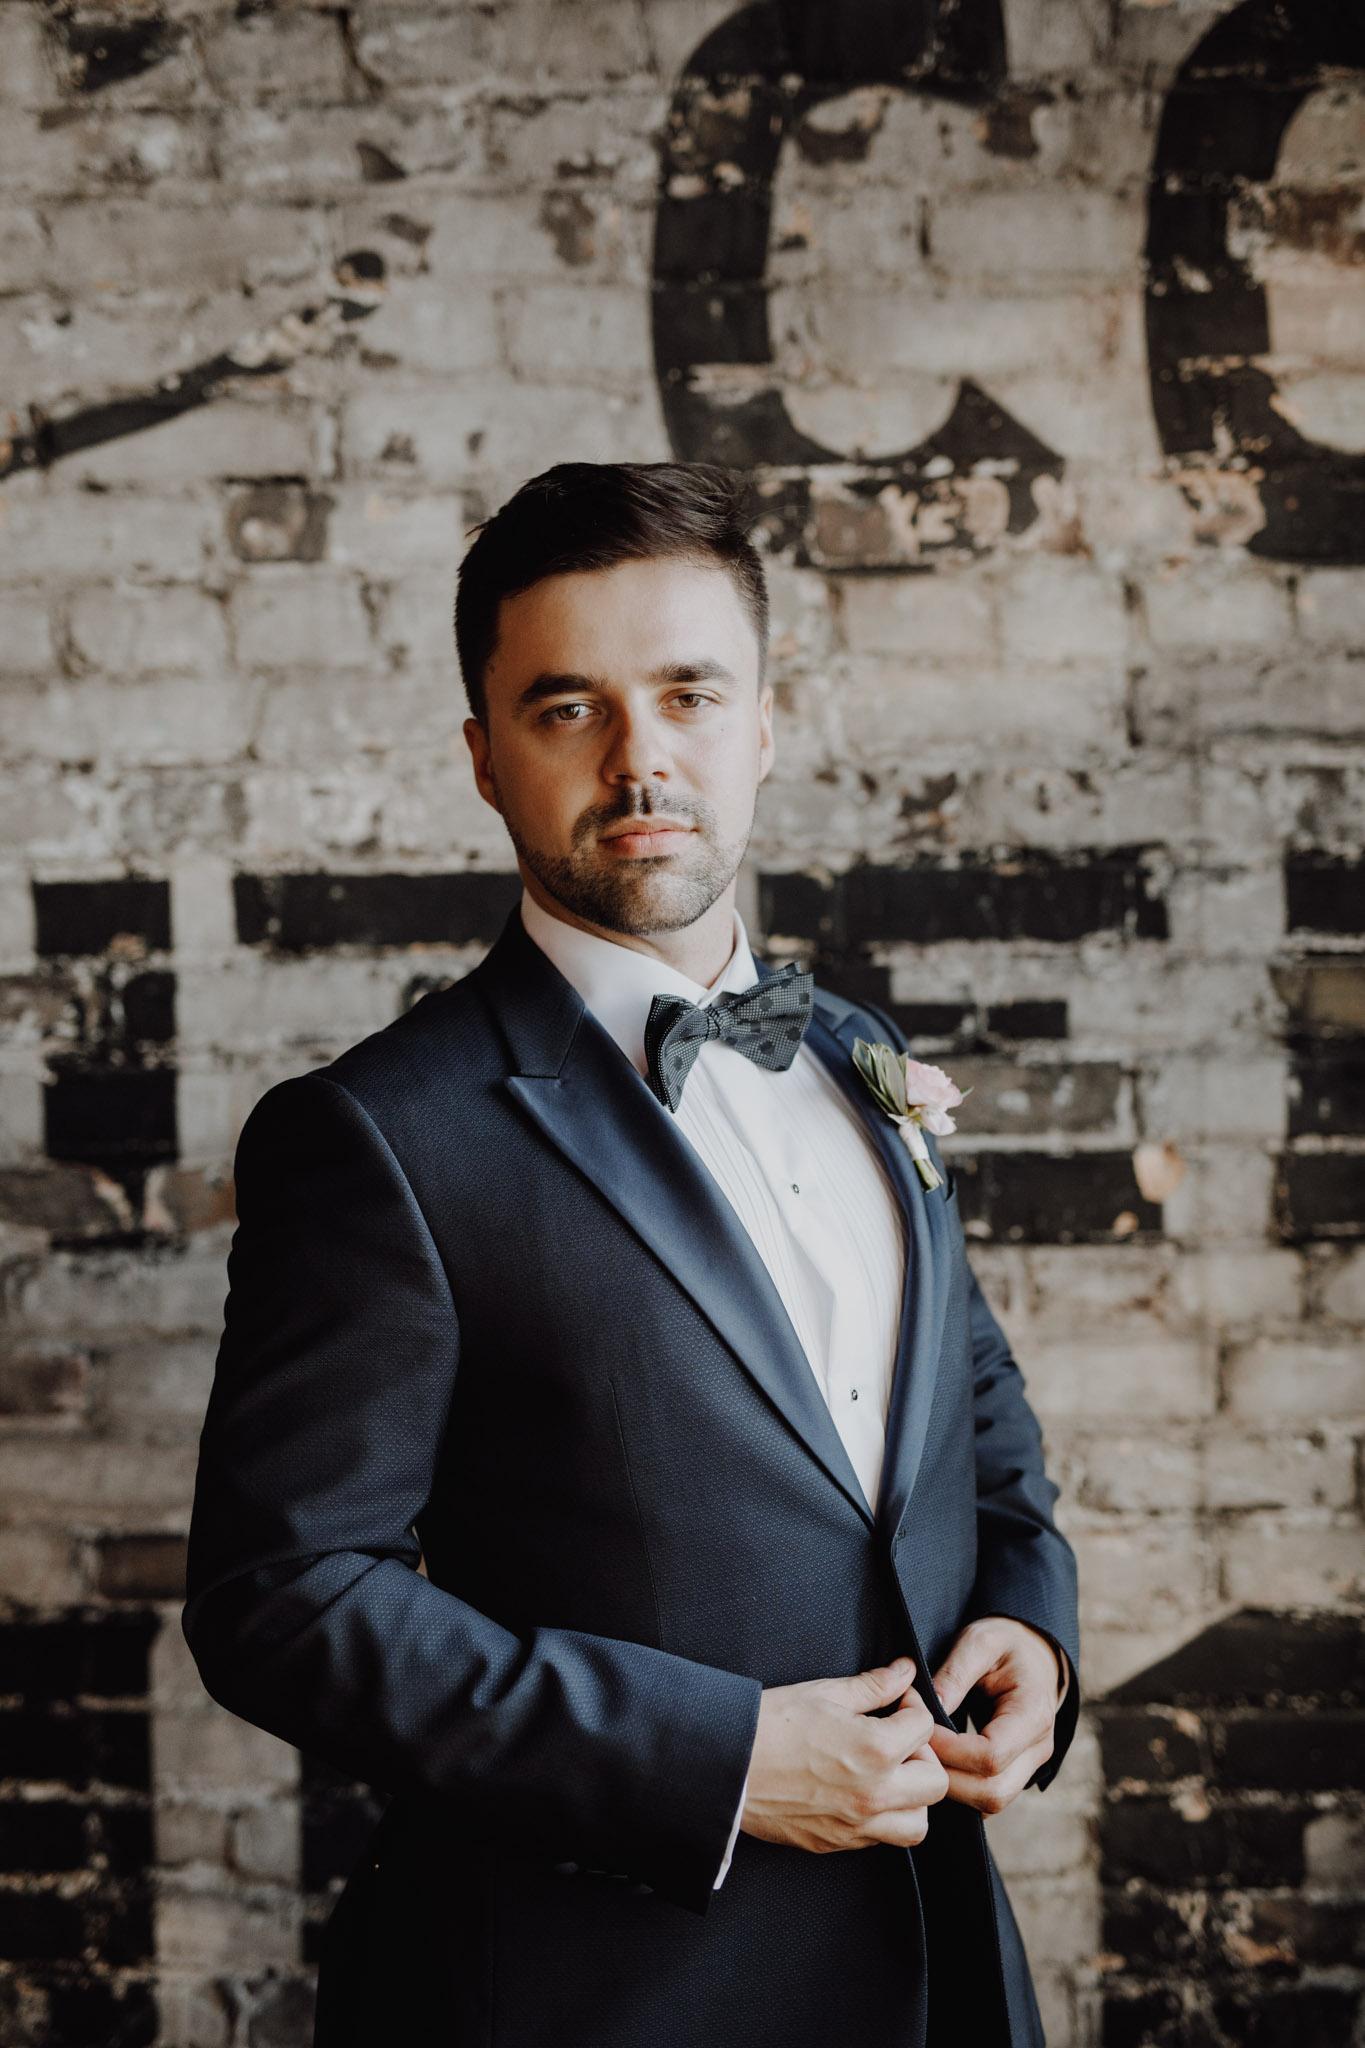 Dapper groom at The Burroughes Wedding. Love By Lynzie. Wedding Photographer Jennifer See Studios.